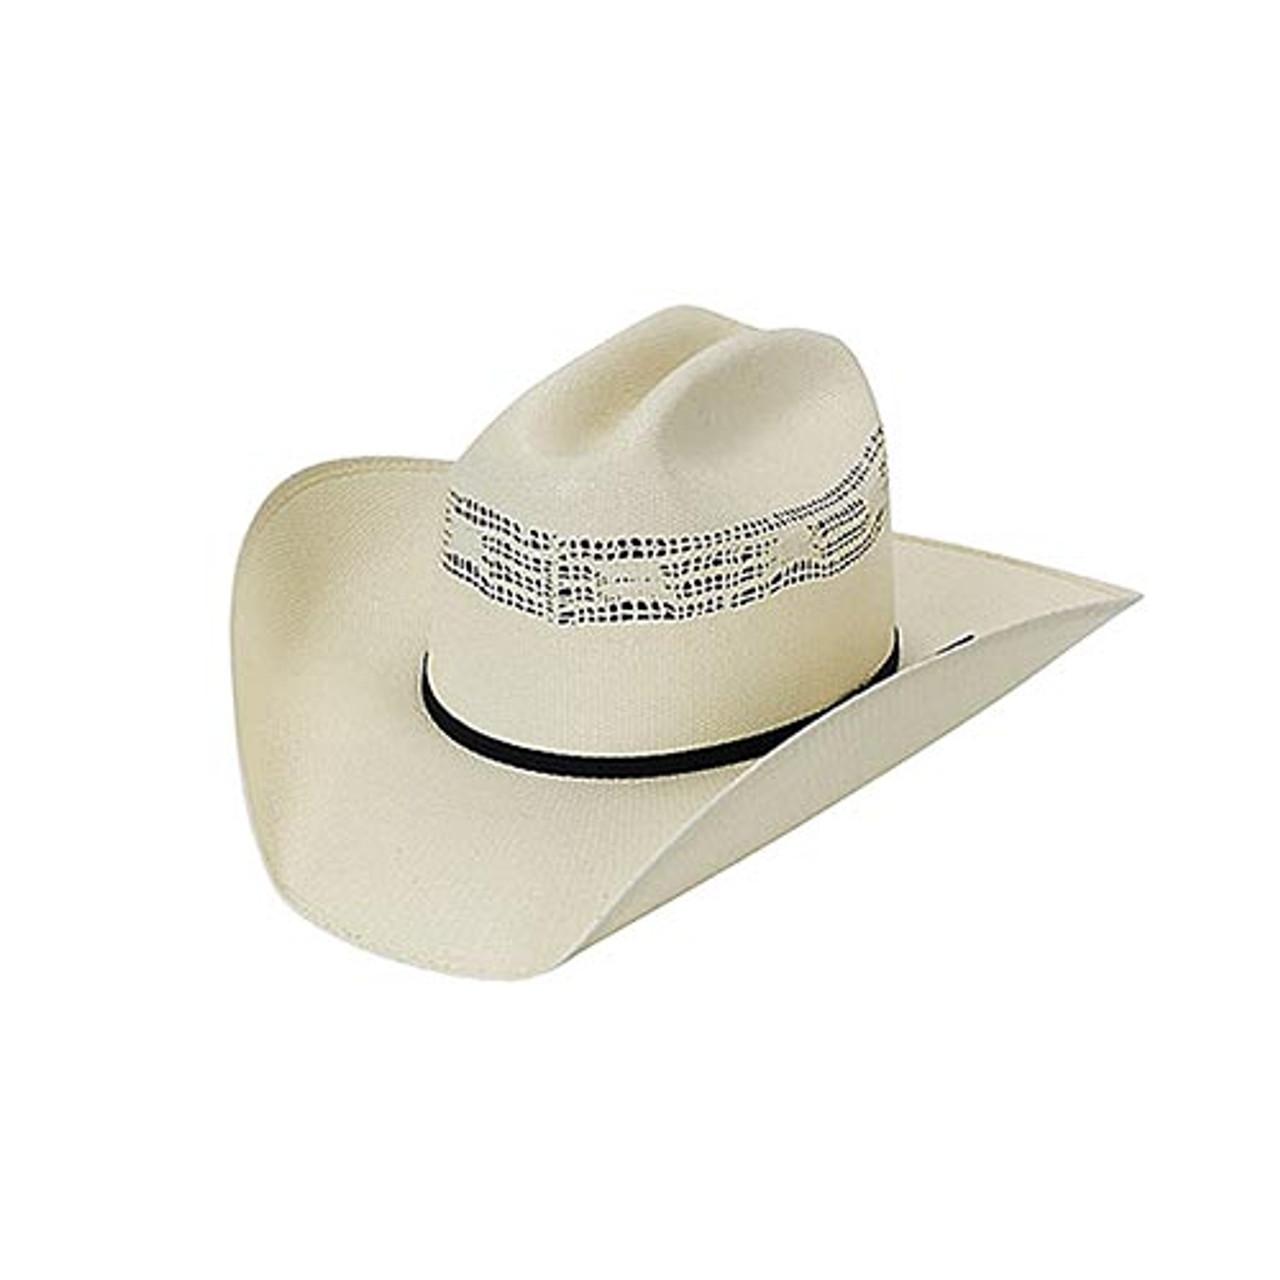 6274c88cfa253e Justin Straw Hats - Justin 20X Bryson Bangora Straw Cowboy Hat ...